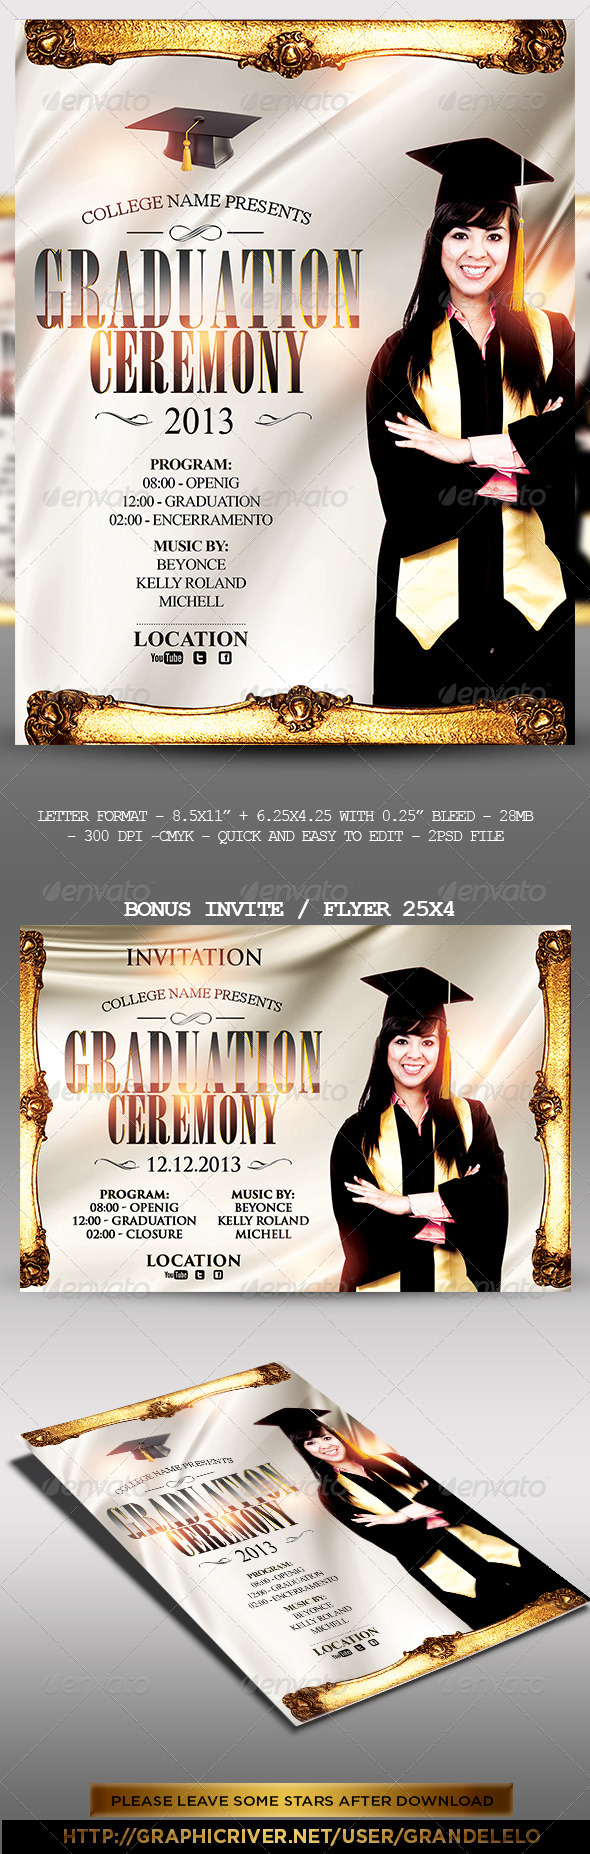 GraphicRiver Graduation Event Poster 5279462